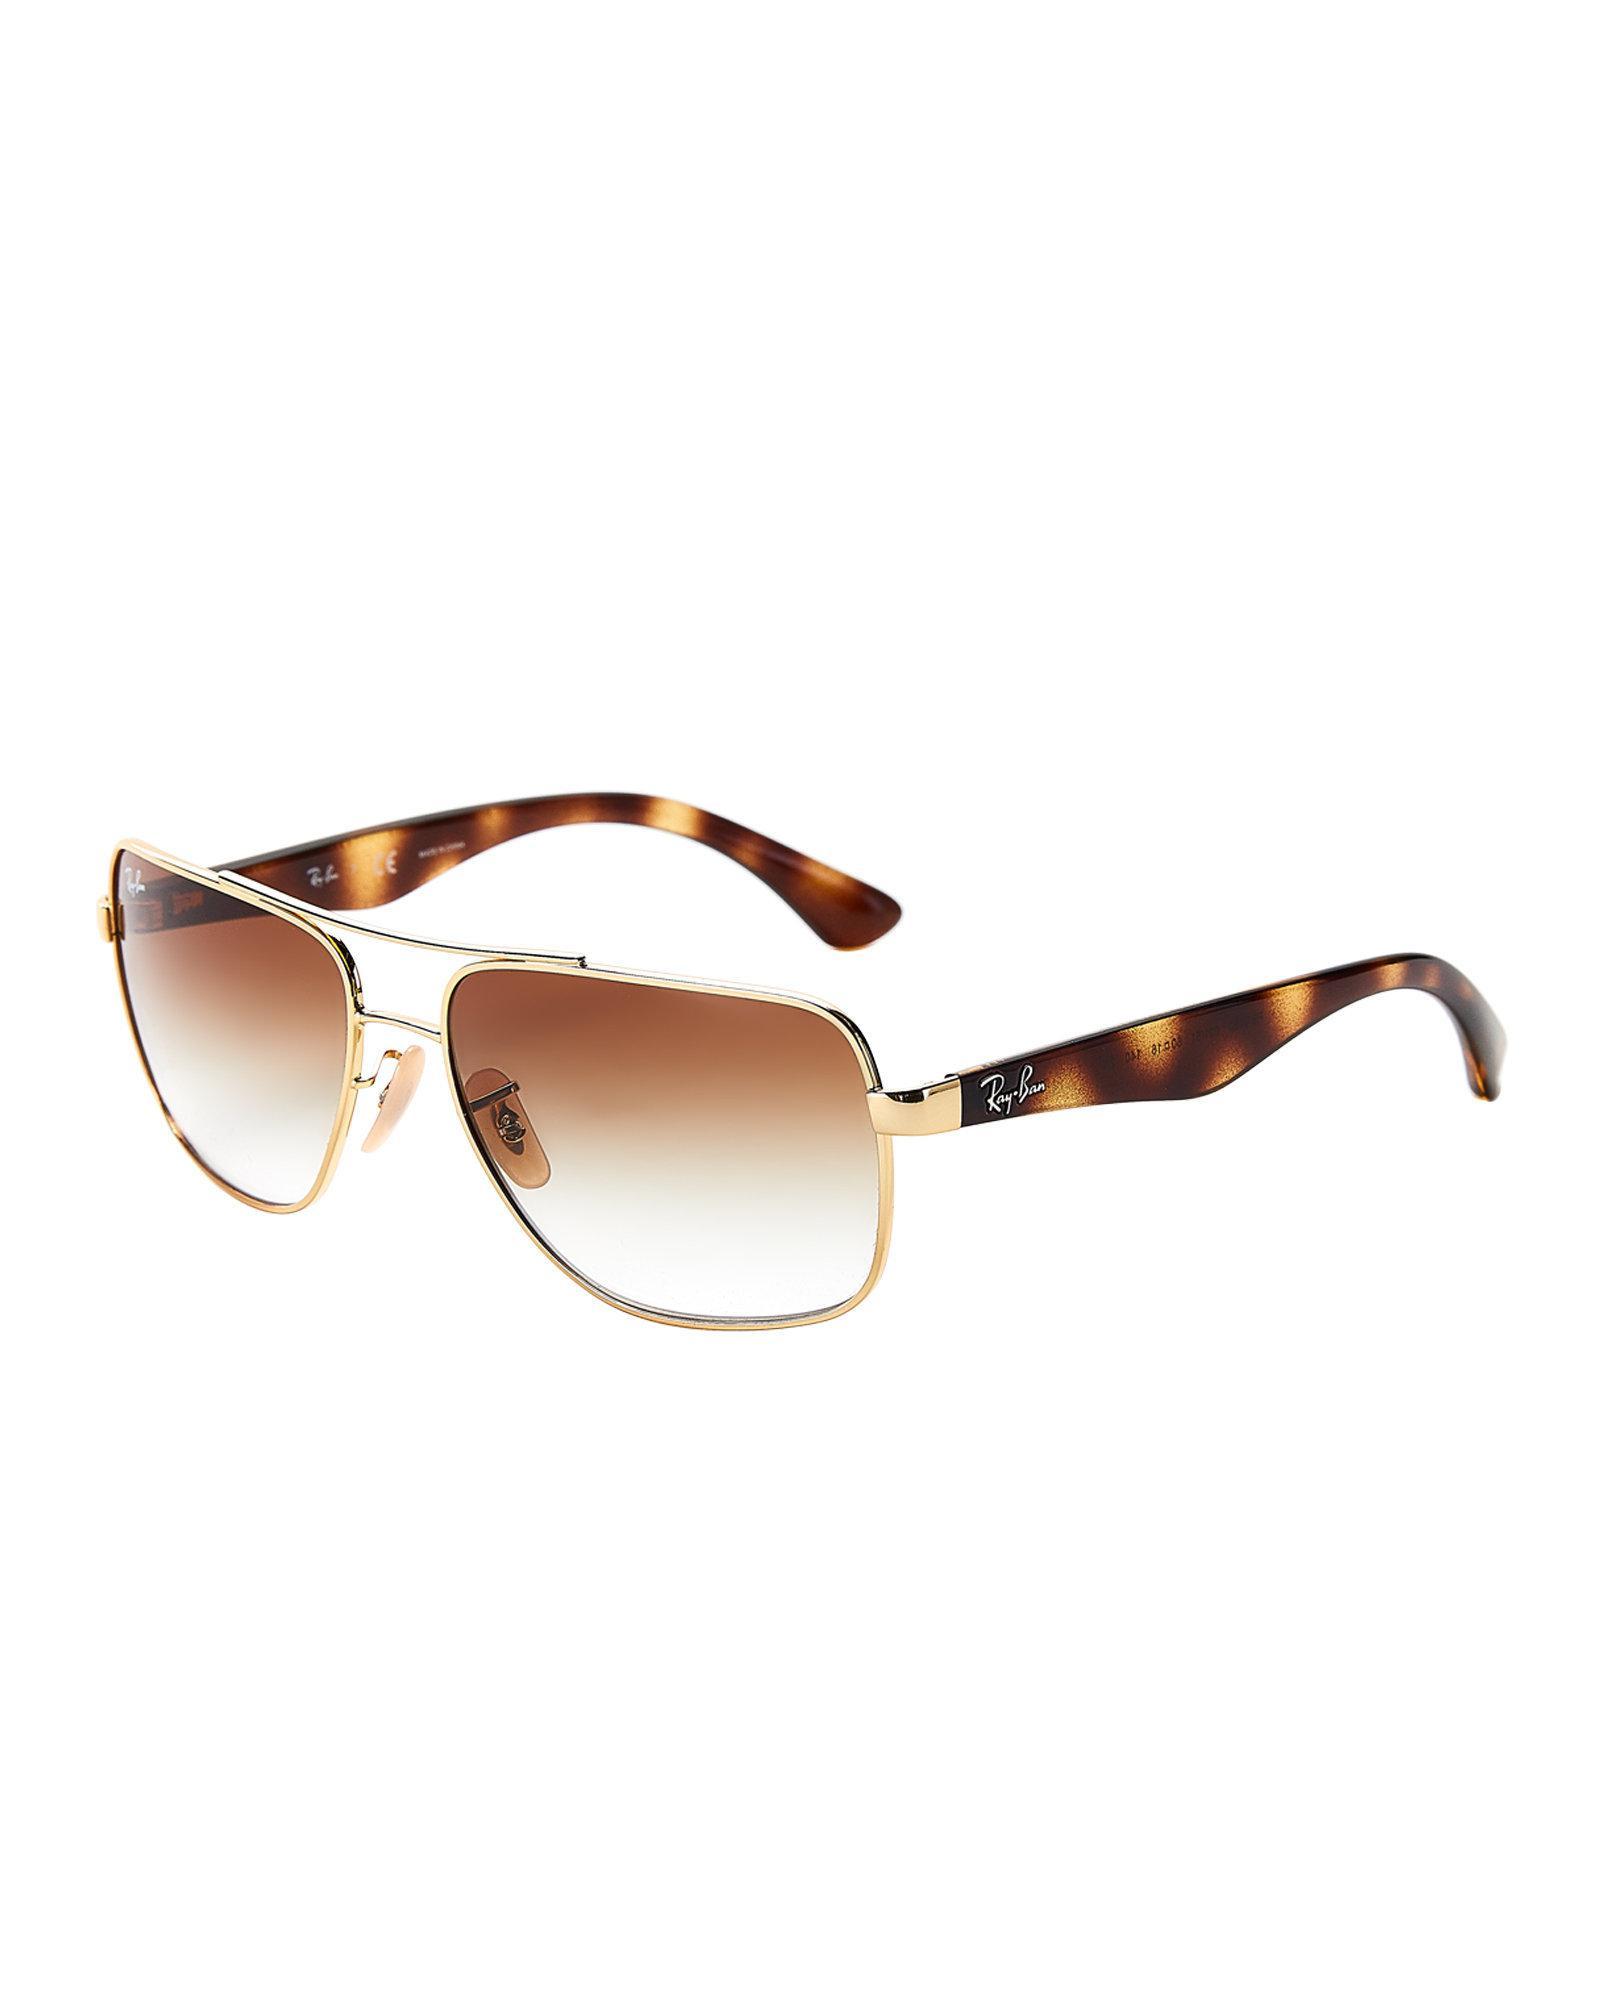 09f6af880d ... promo code for ray ban. mens rb3483 gold tone navigator sunglasses  ab336 4273f ...